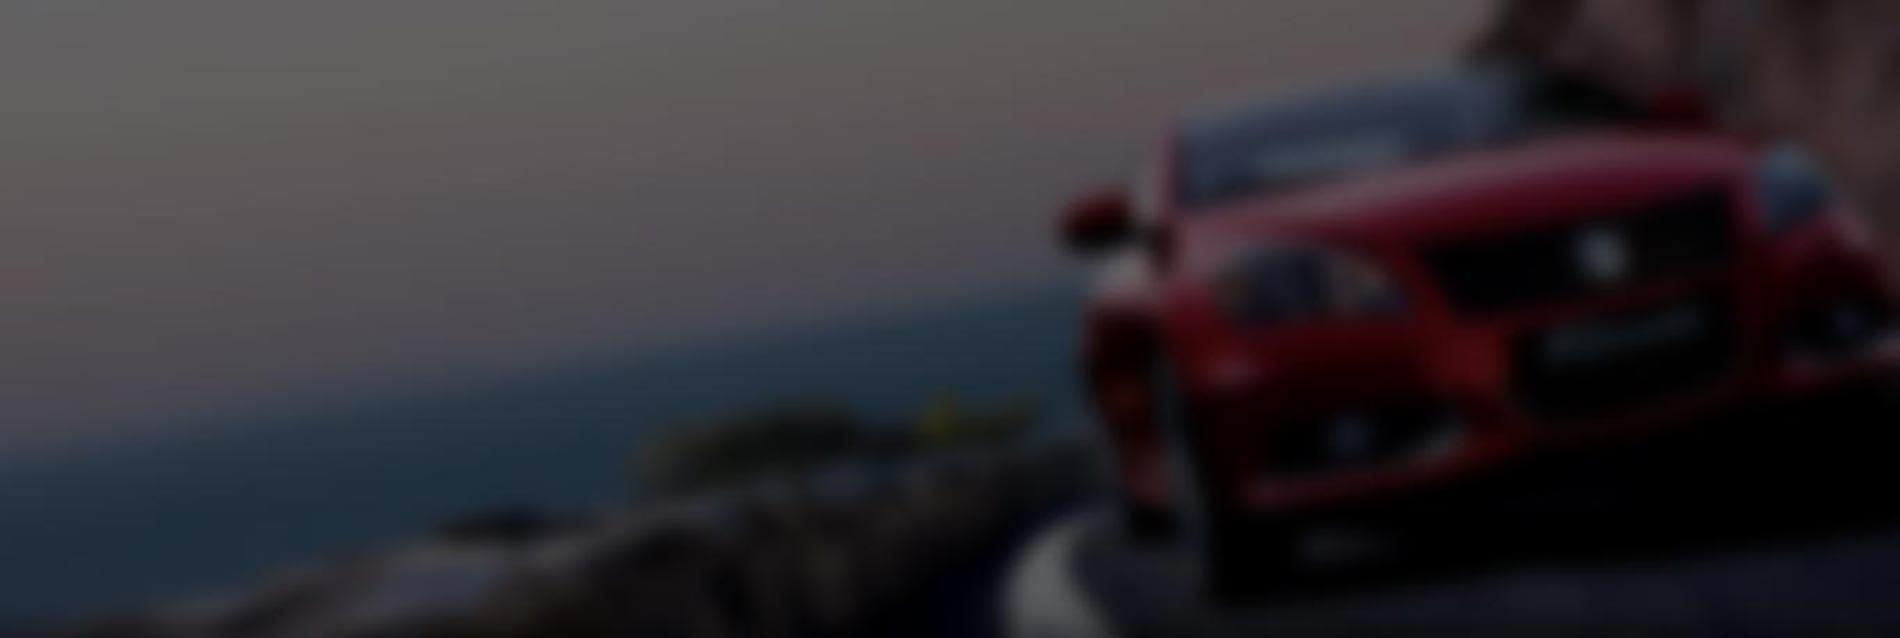 Red suzuki driving on winding road